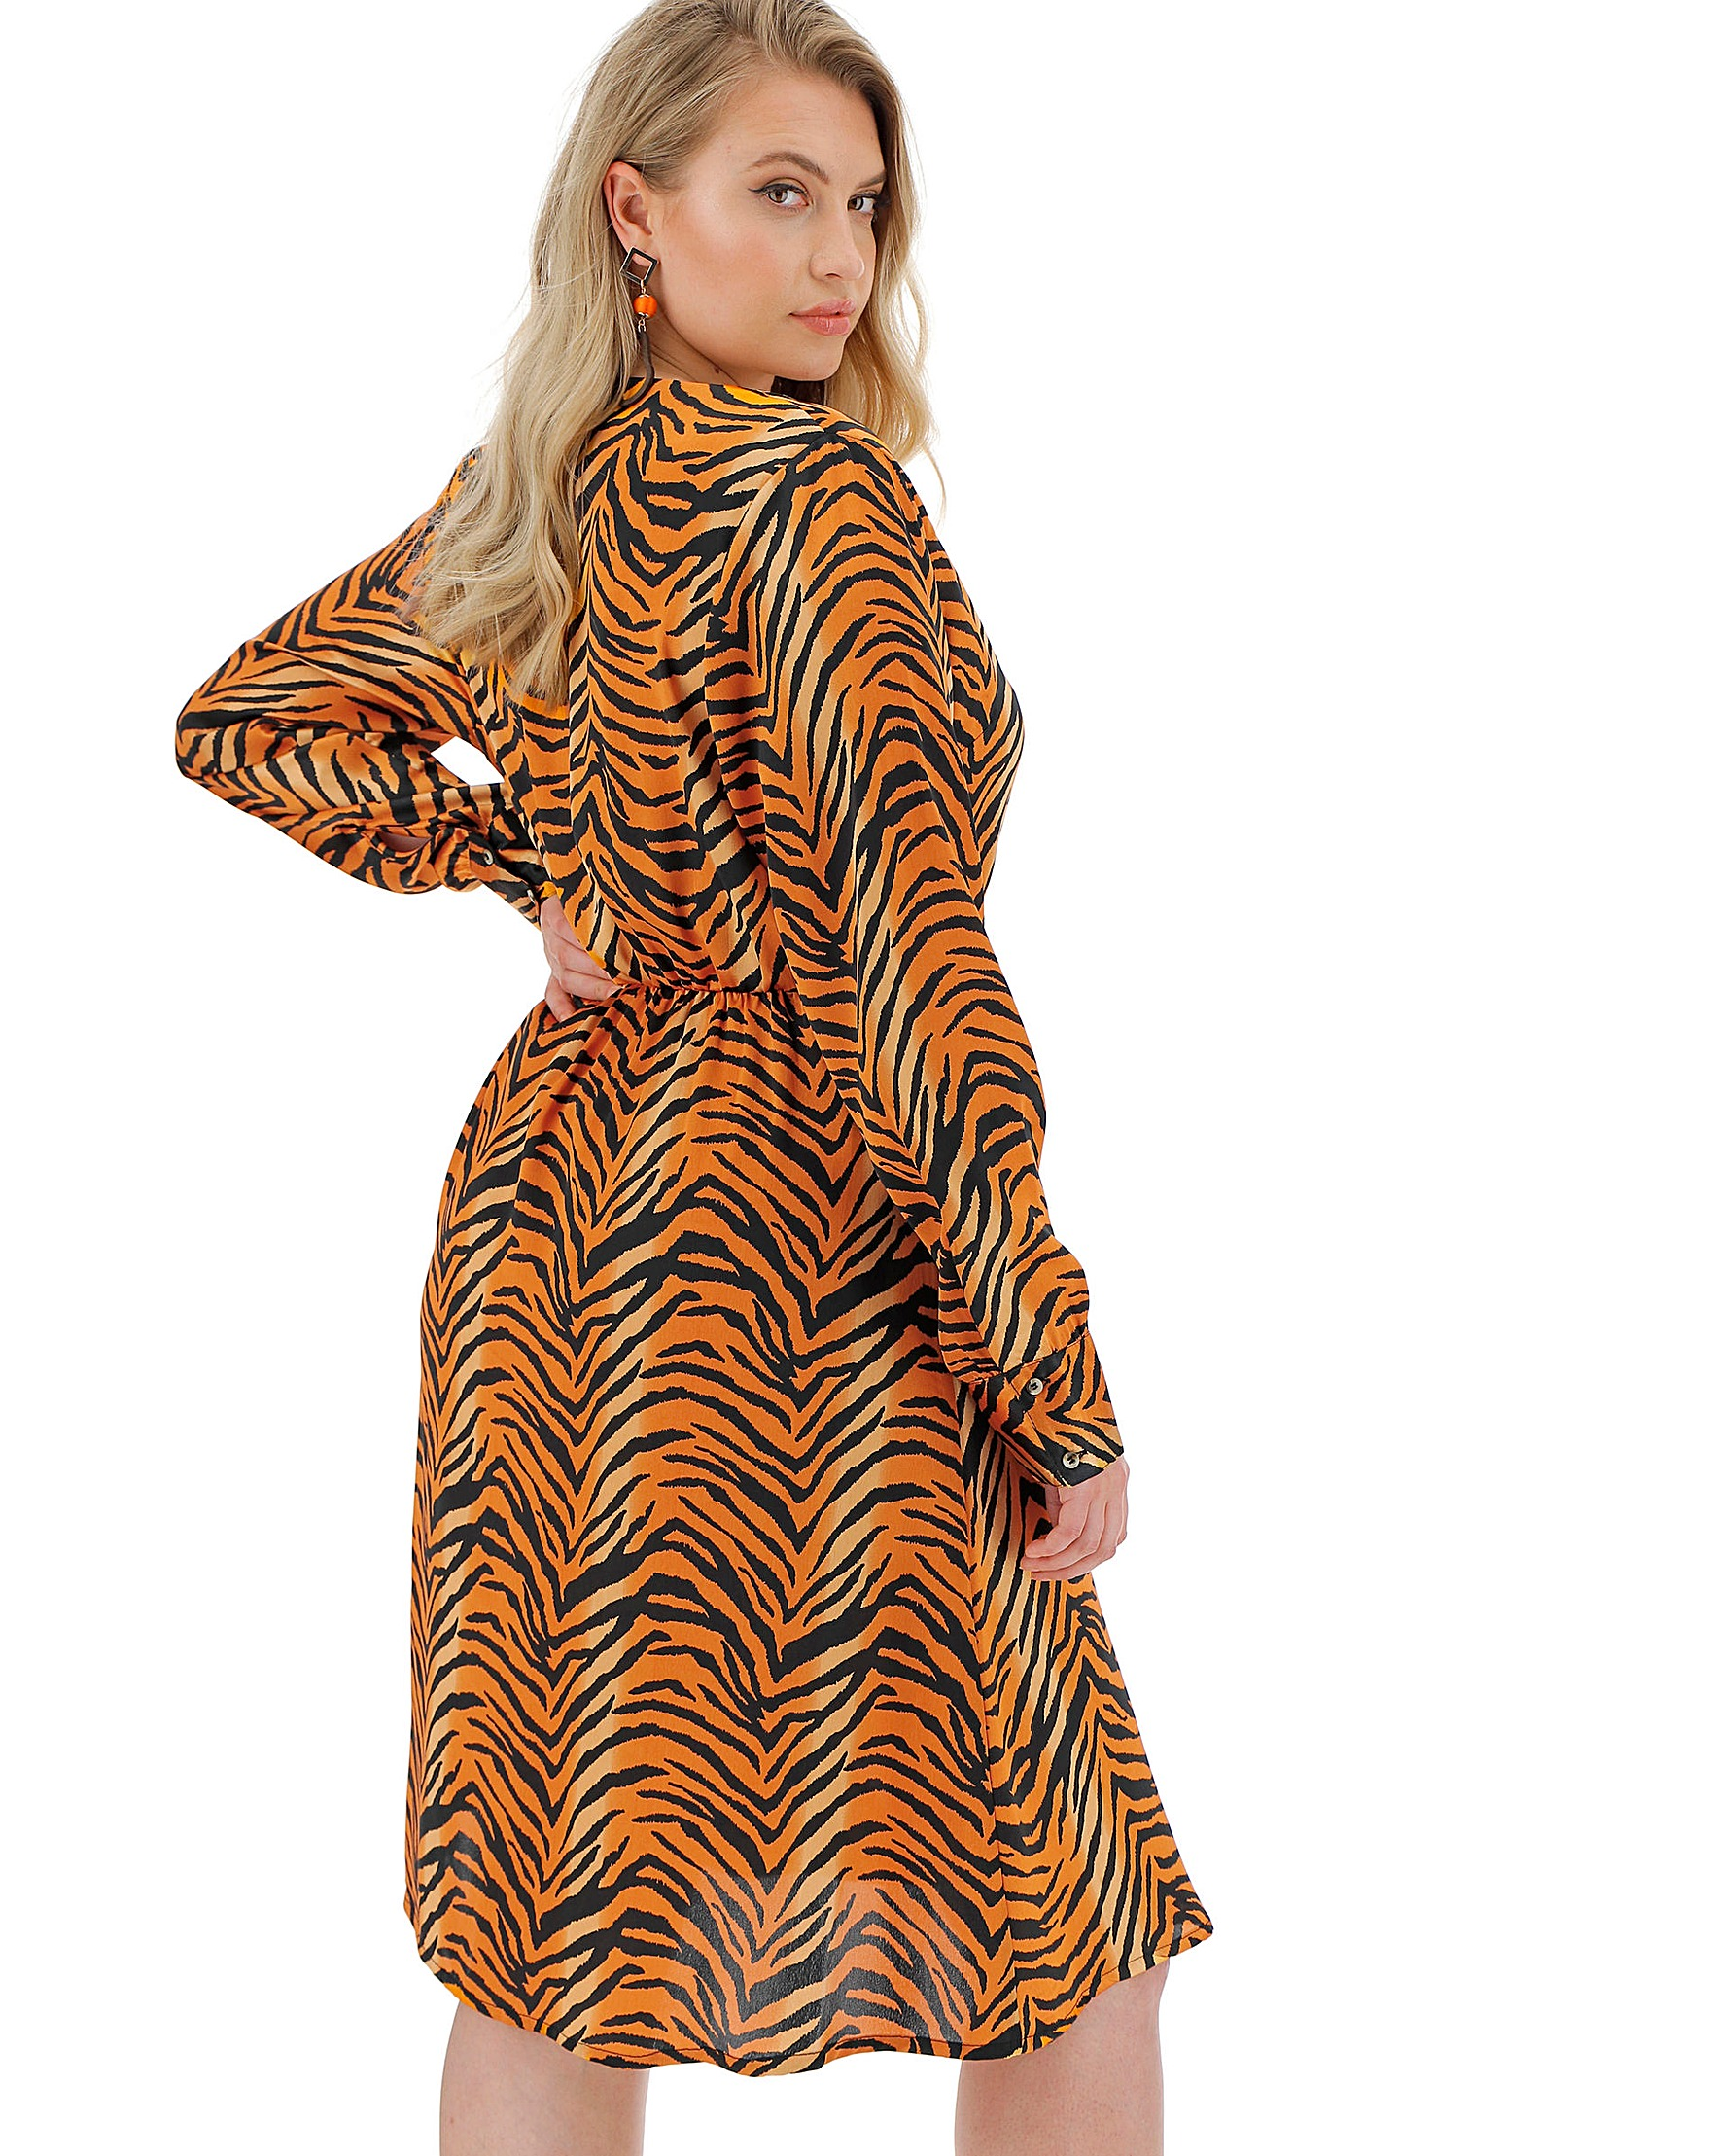 c1203ebfcf Tiger Print Wrap Dress | Simply Be